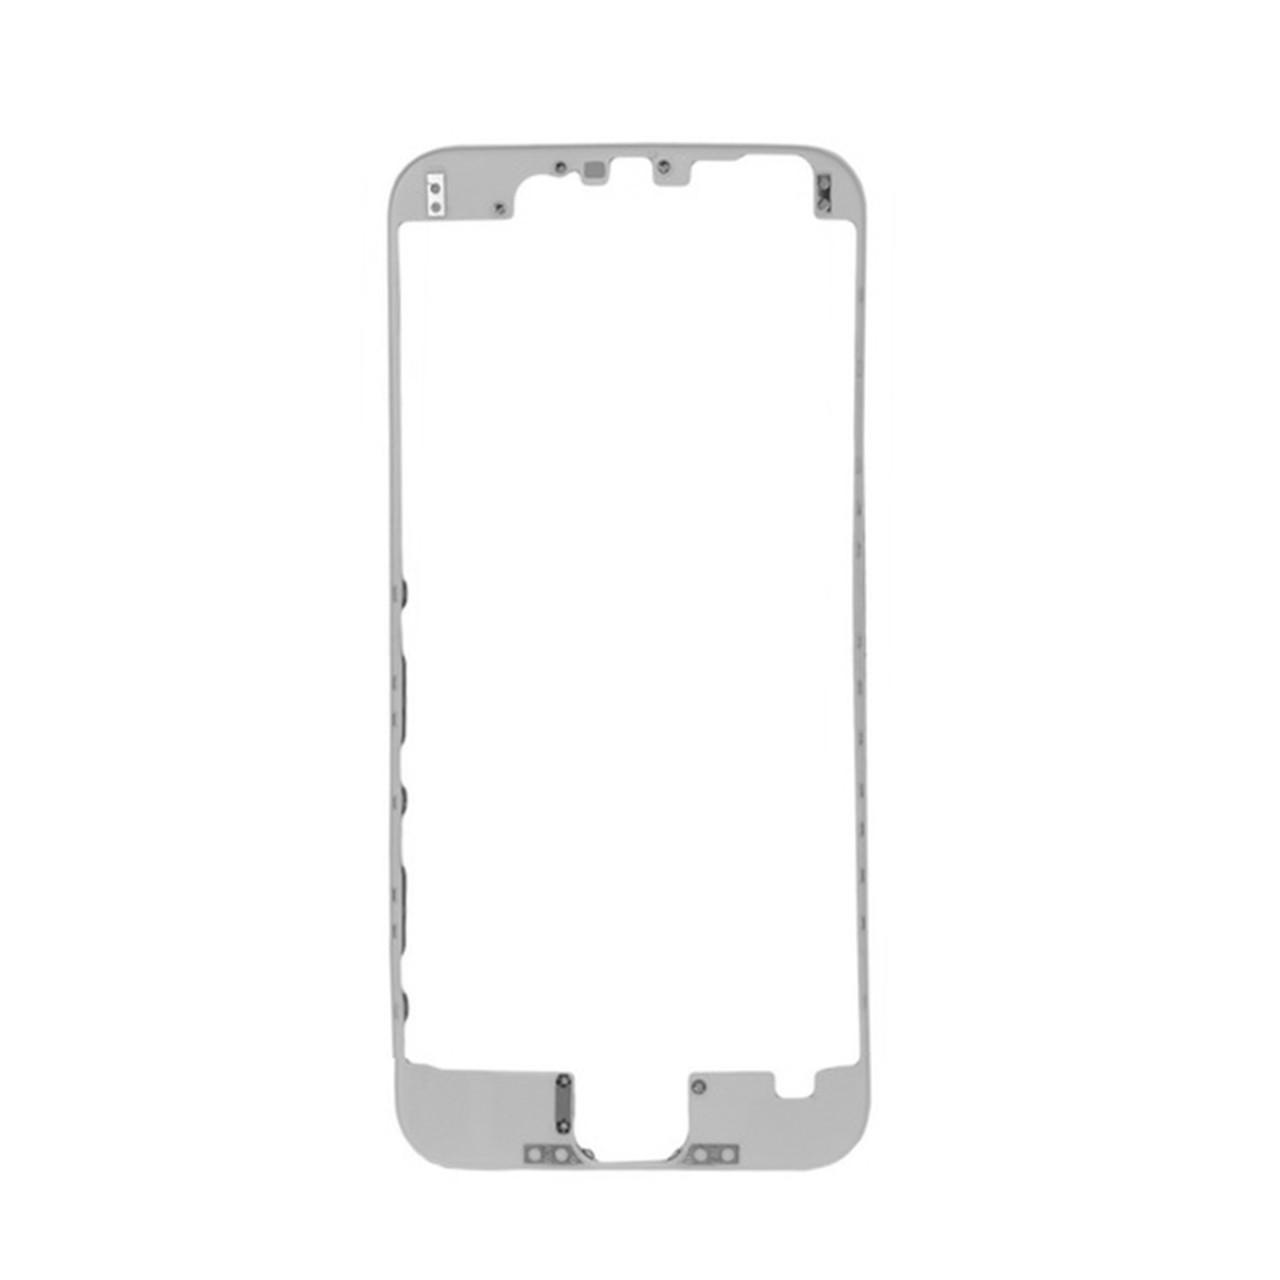 Рамка для дисплея Apple iPhone 6G внутренняя пустая без клея White (7)